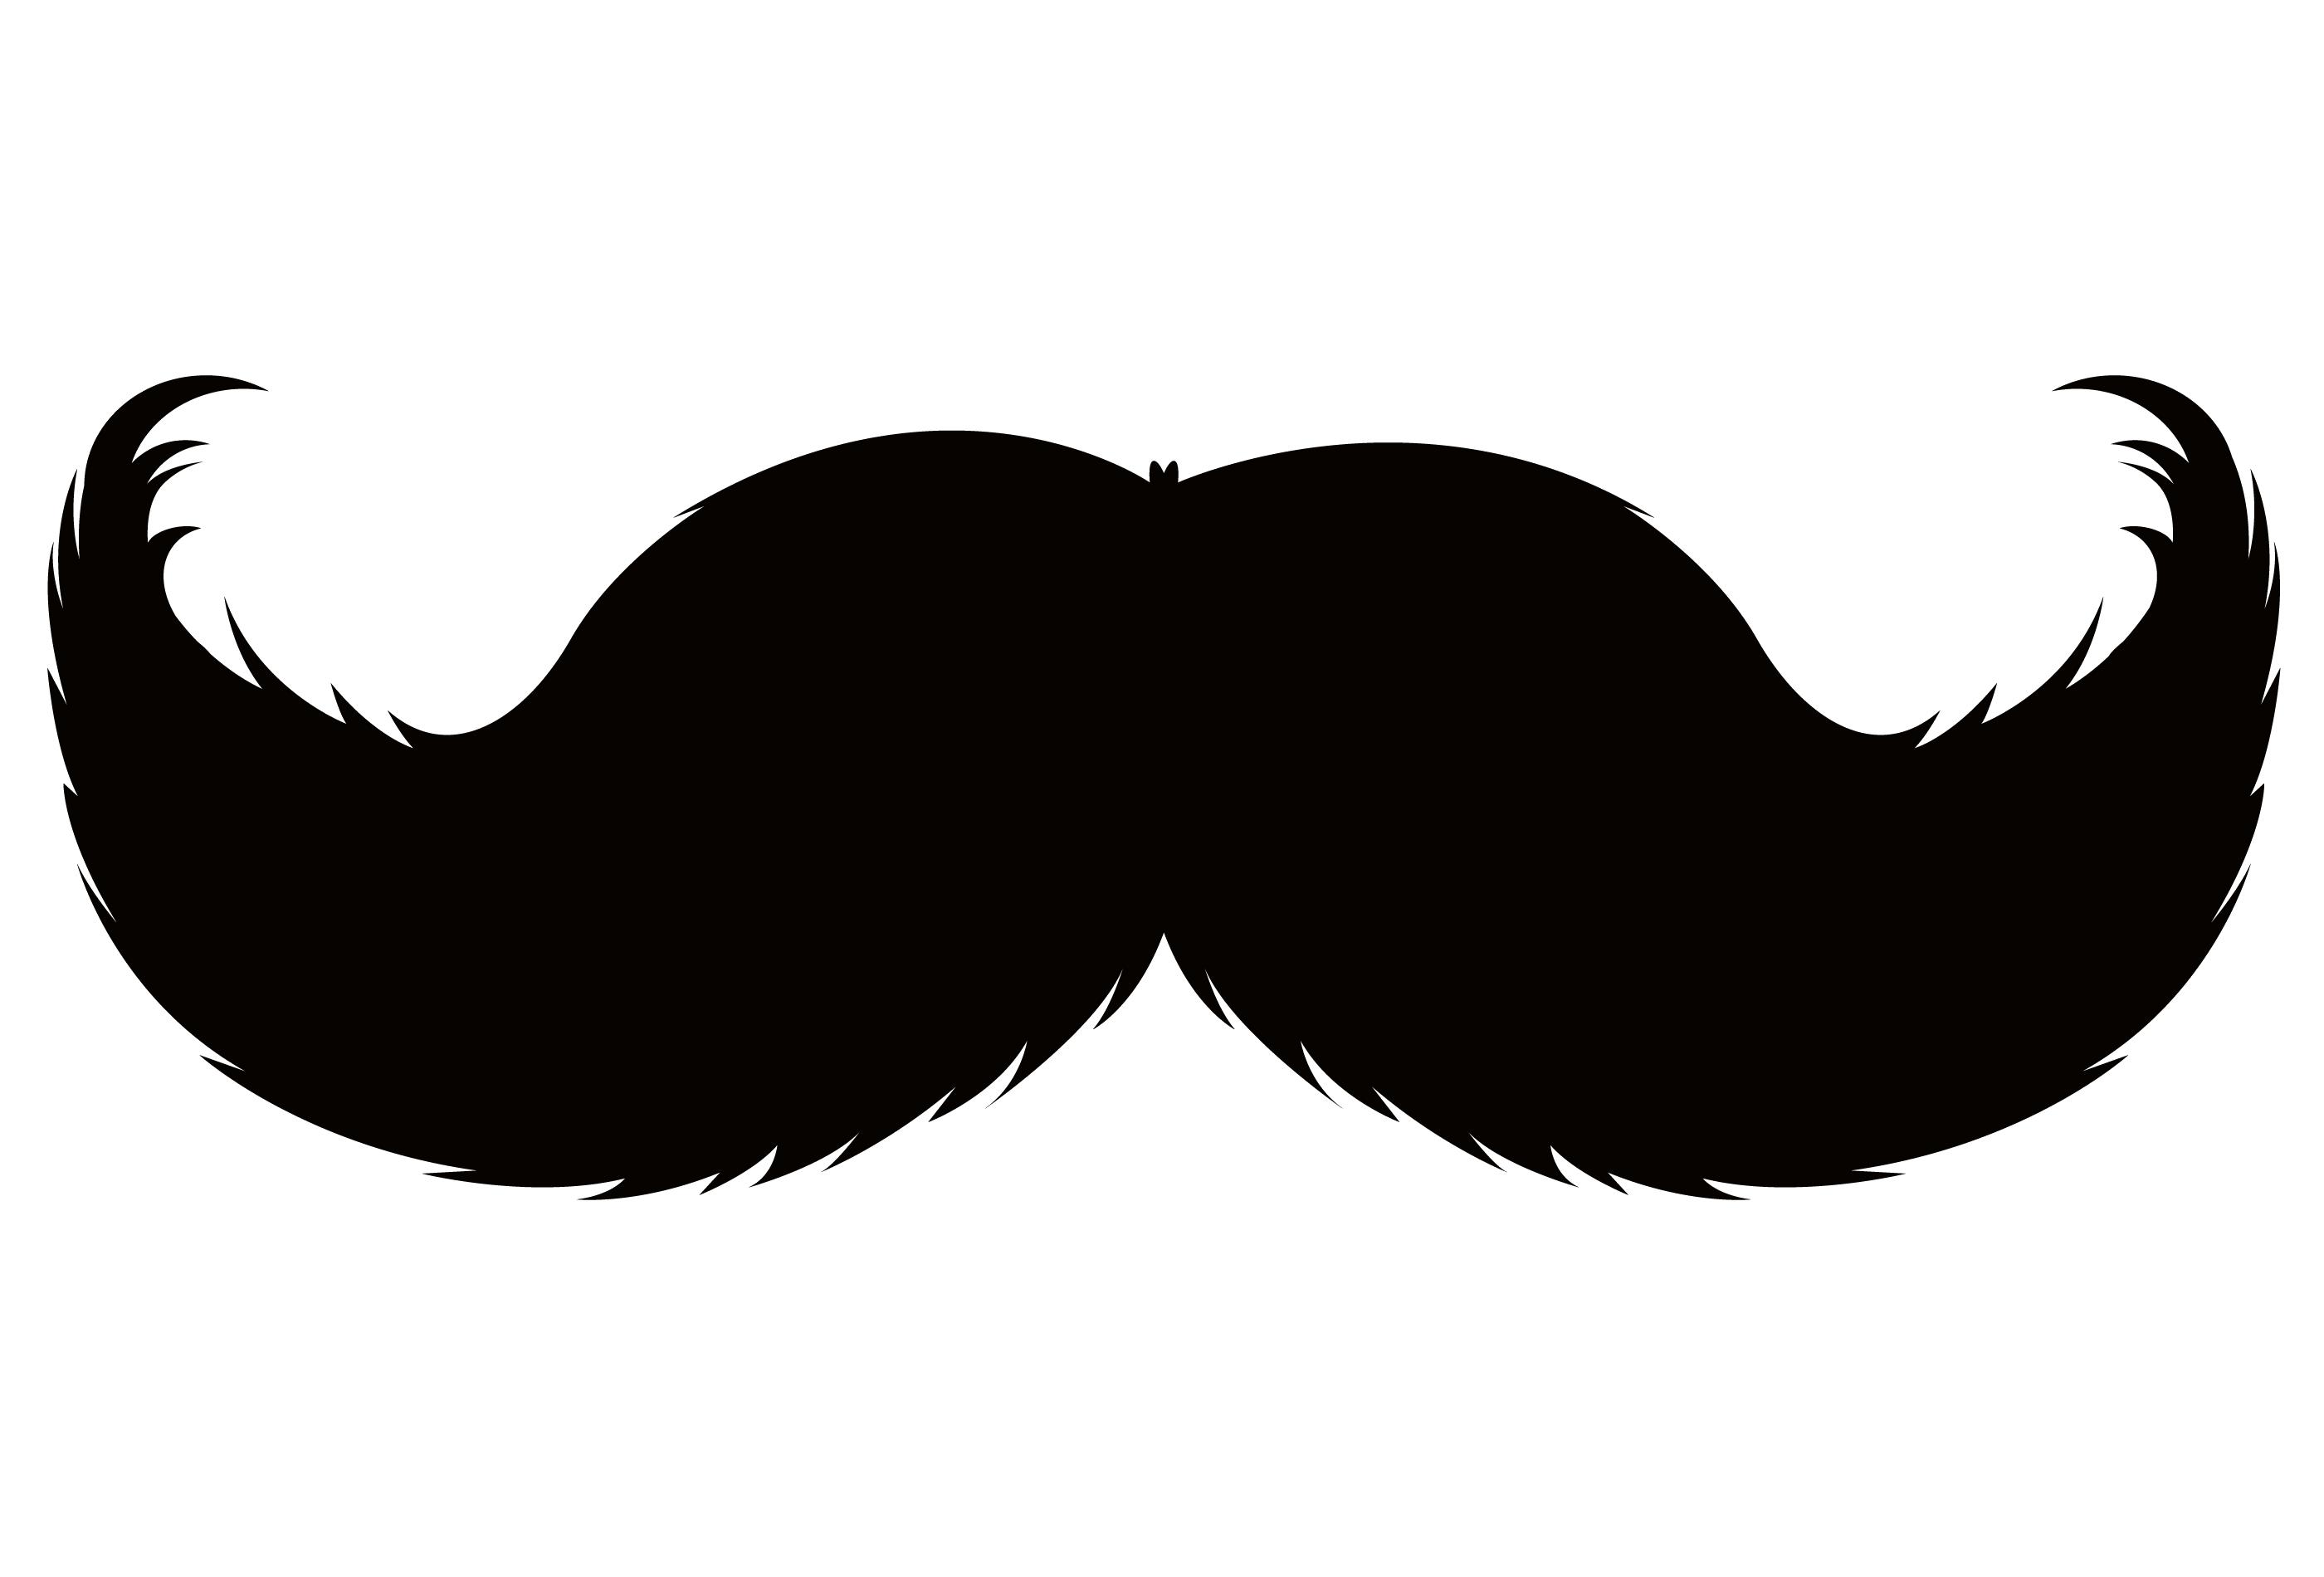 Handlebar moustache Pencil moustache Beard Clip art.